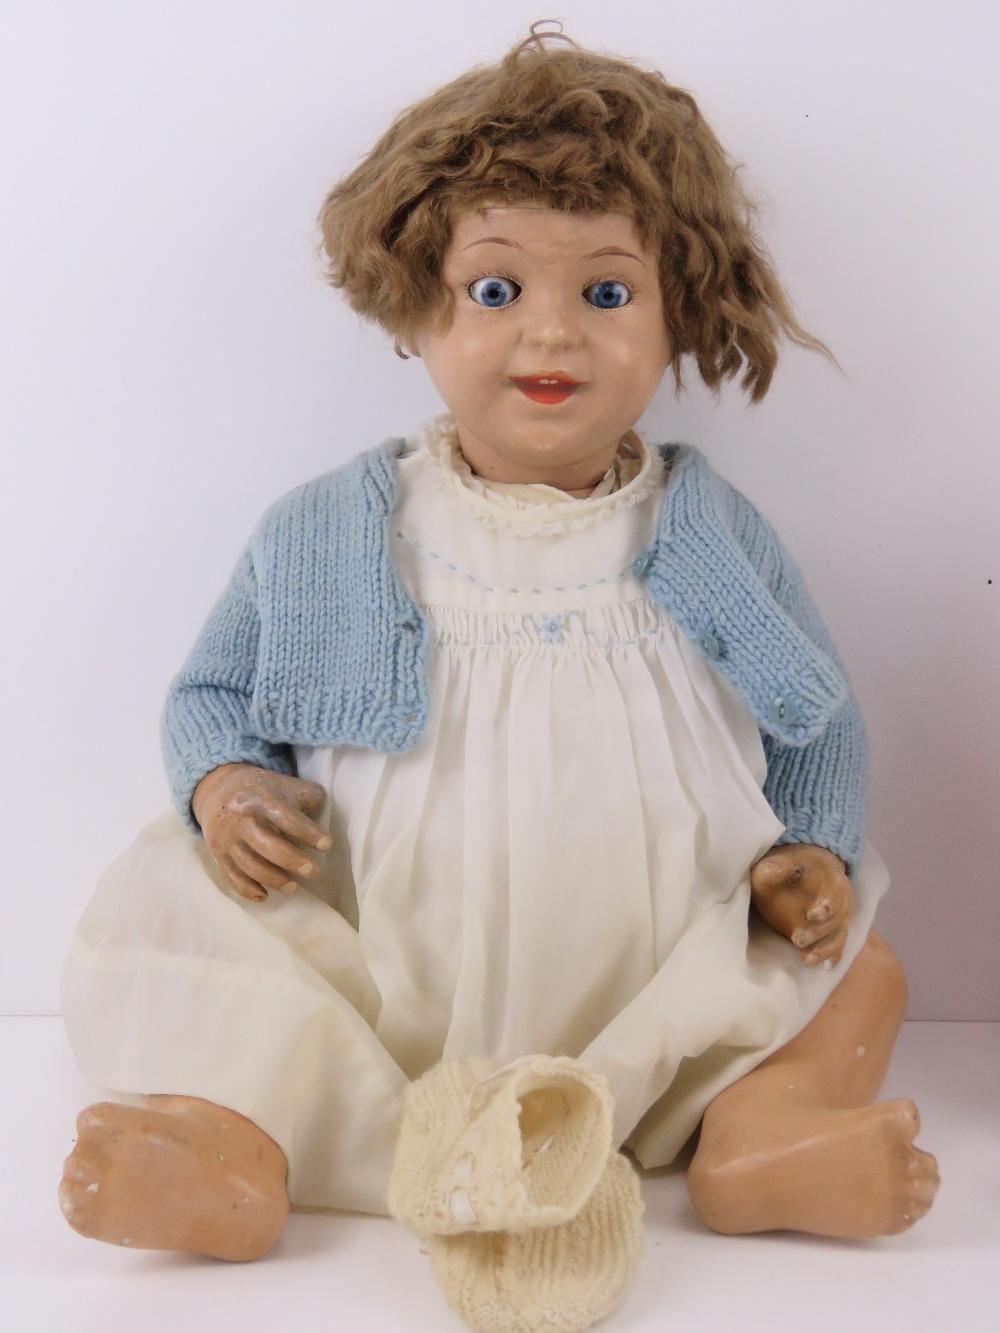 A vintage doll having glass eyes, handpa - Image 3 of 3